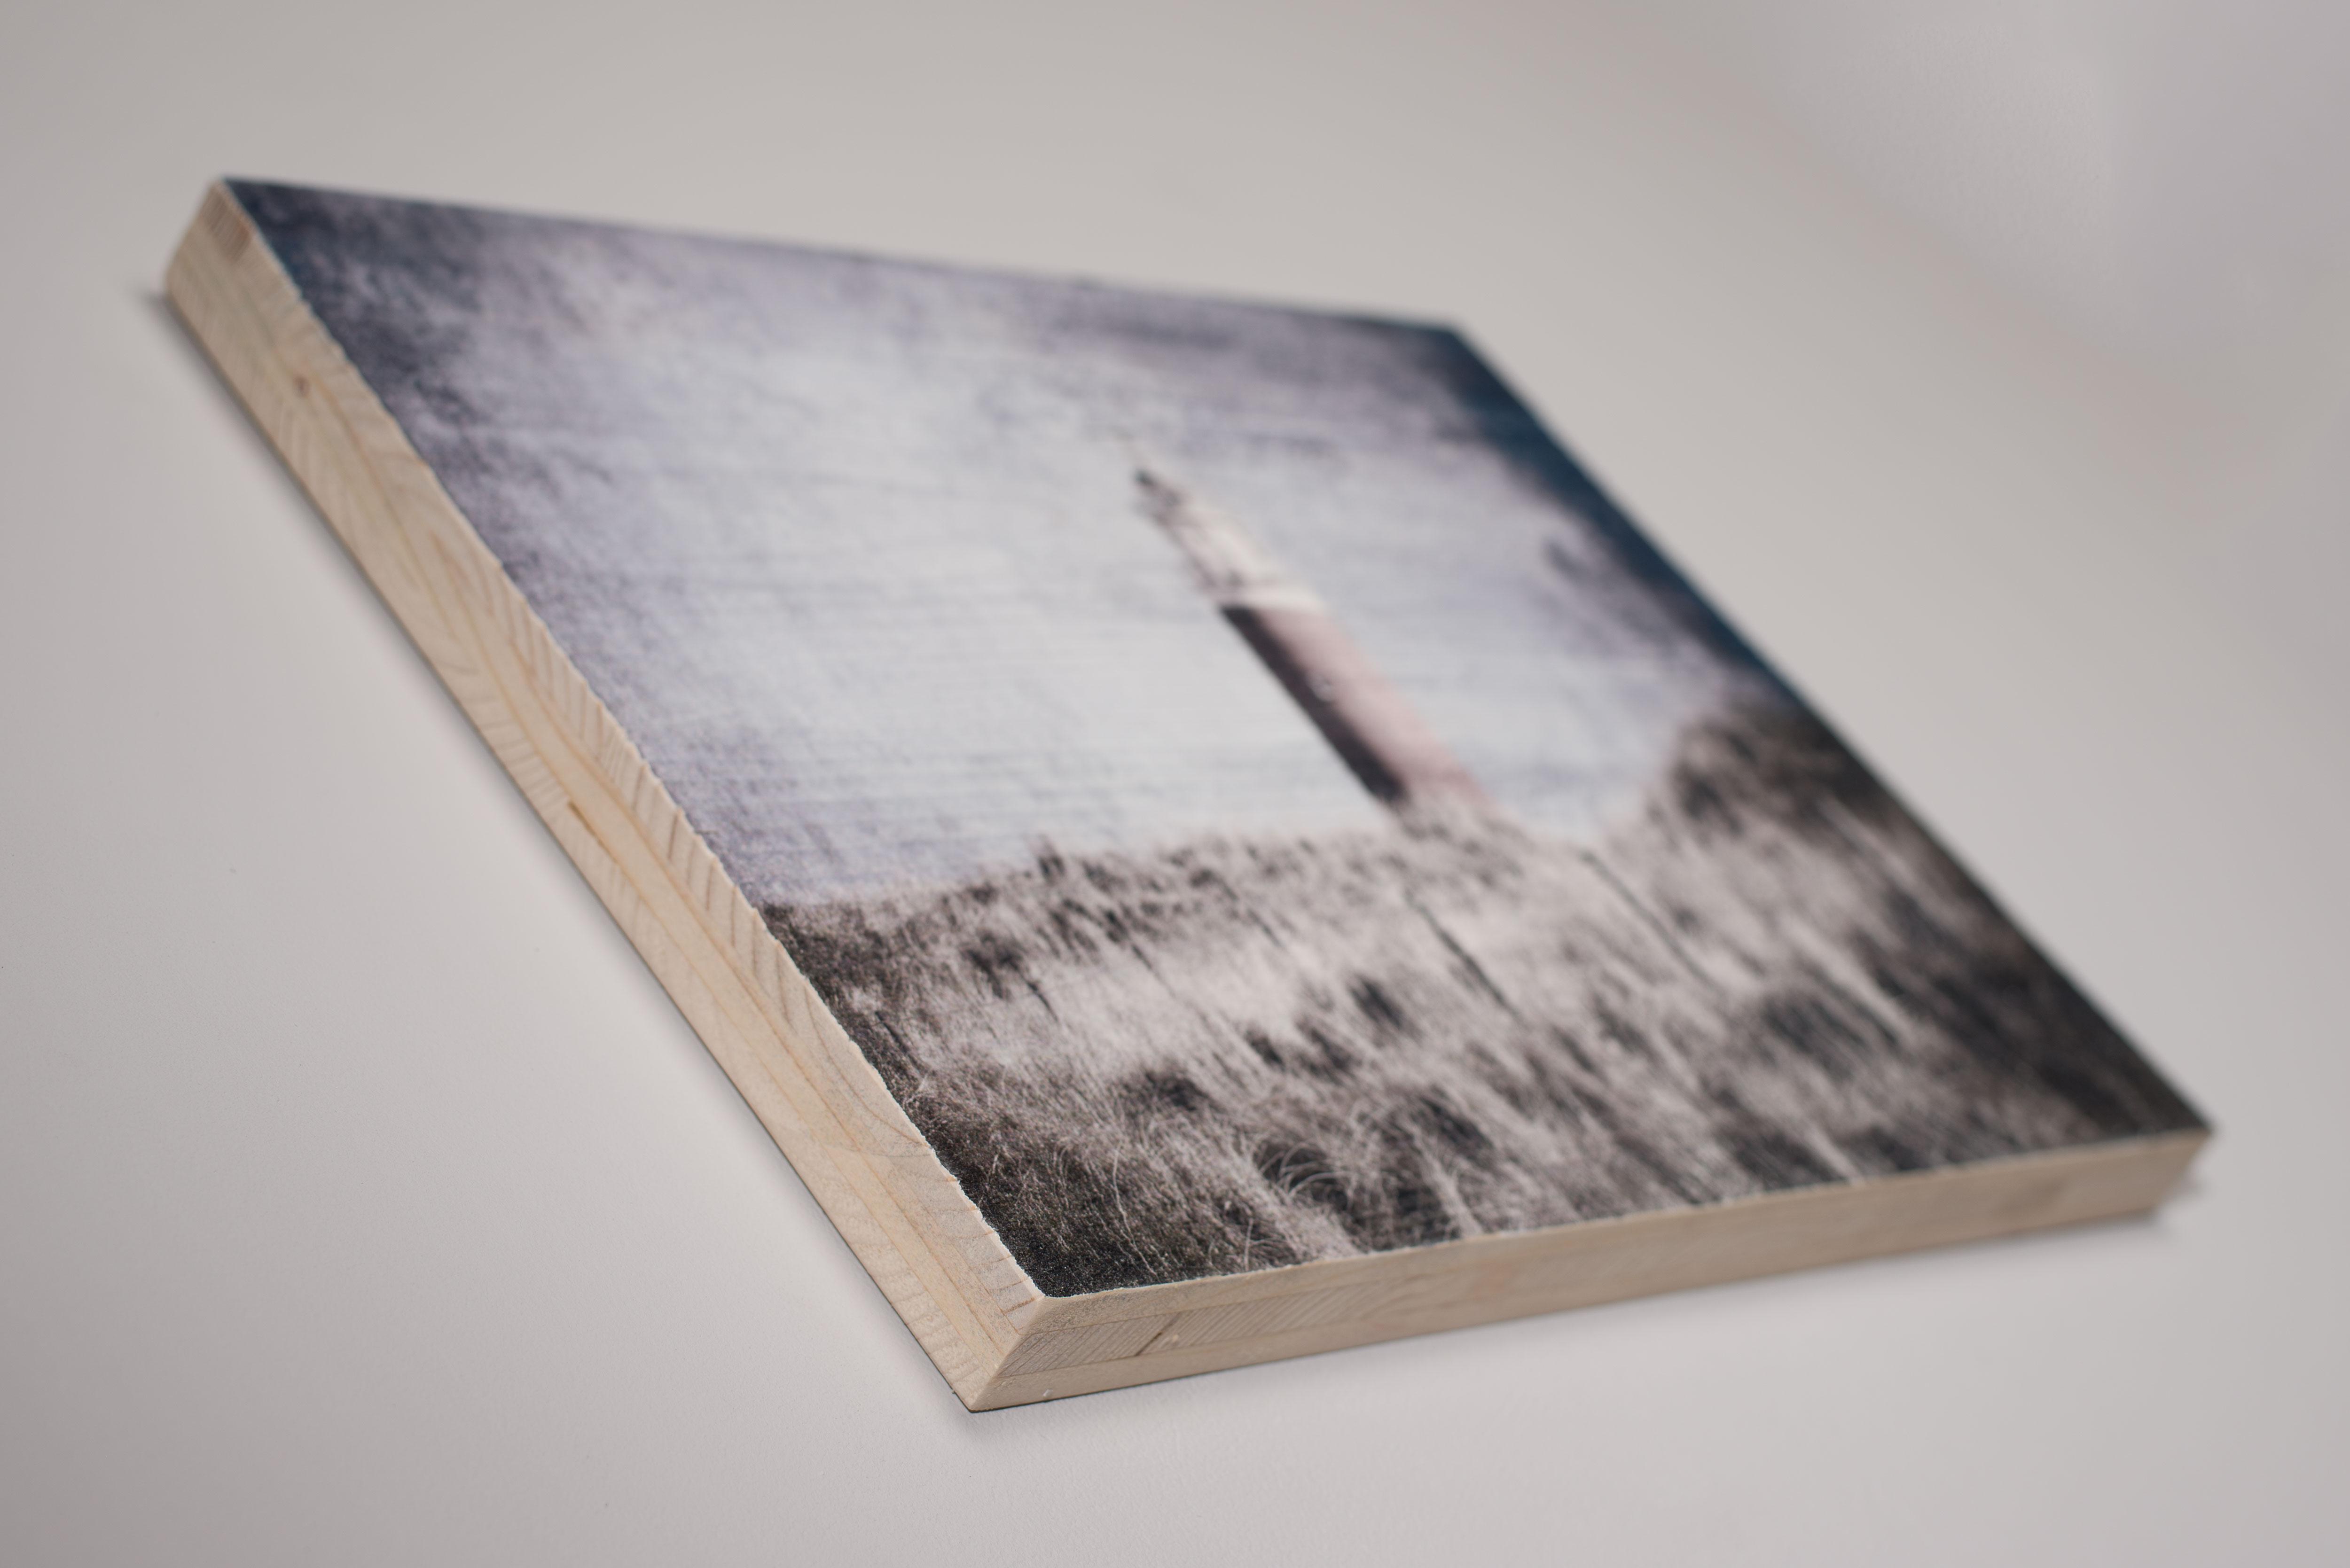 druck auf holz bilderdruck auf holz. Black Bedroom Furniture Sets. Home Design Ideas